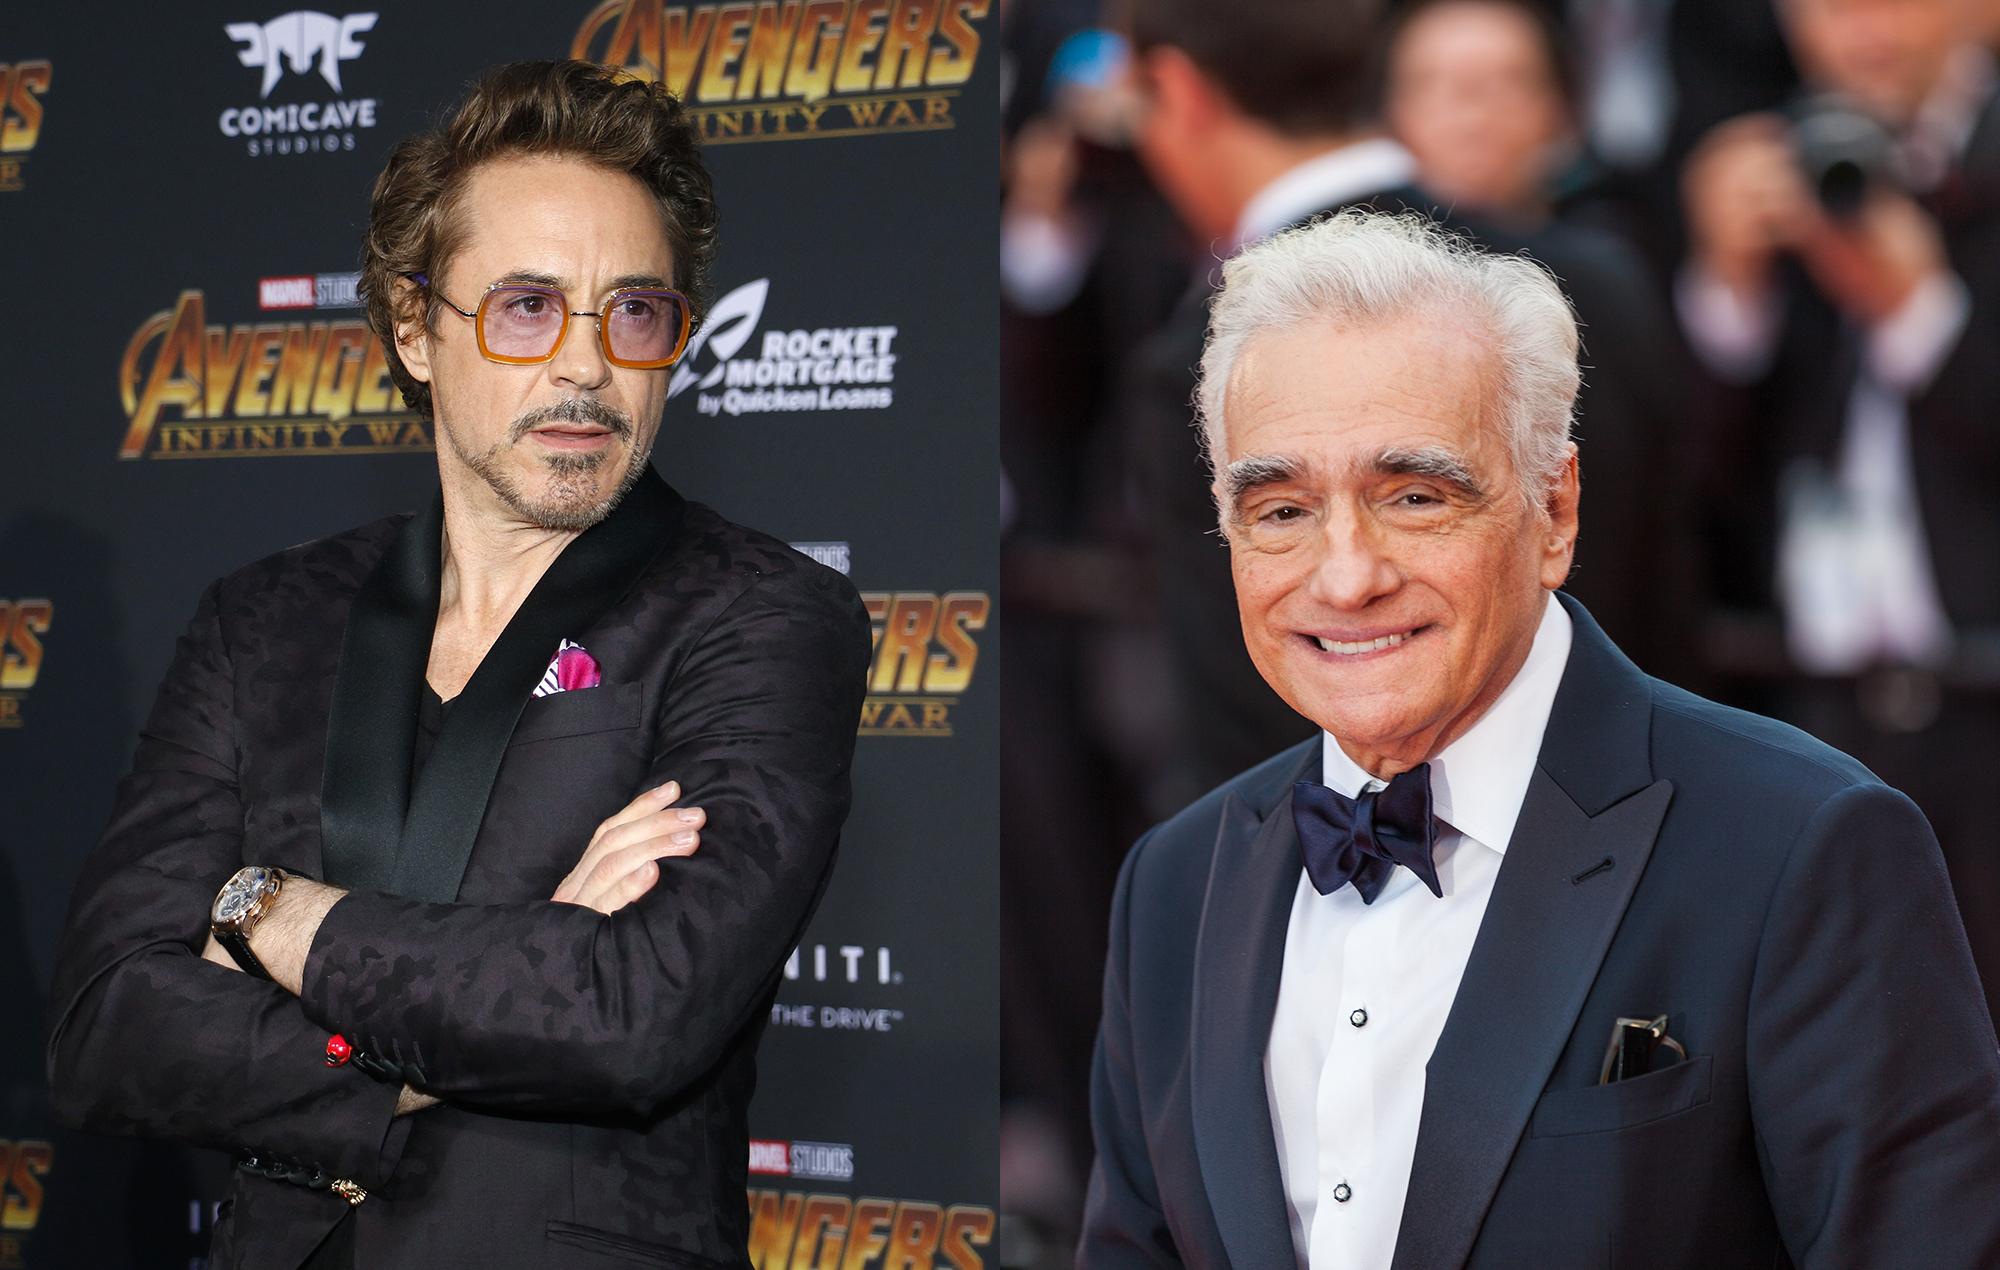 Robert Downey Jr responds to Martin Scorsese's criticism of Marvel